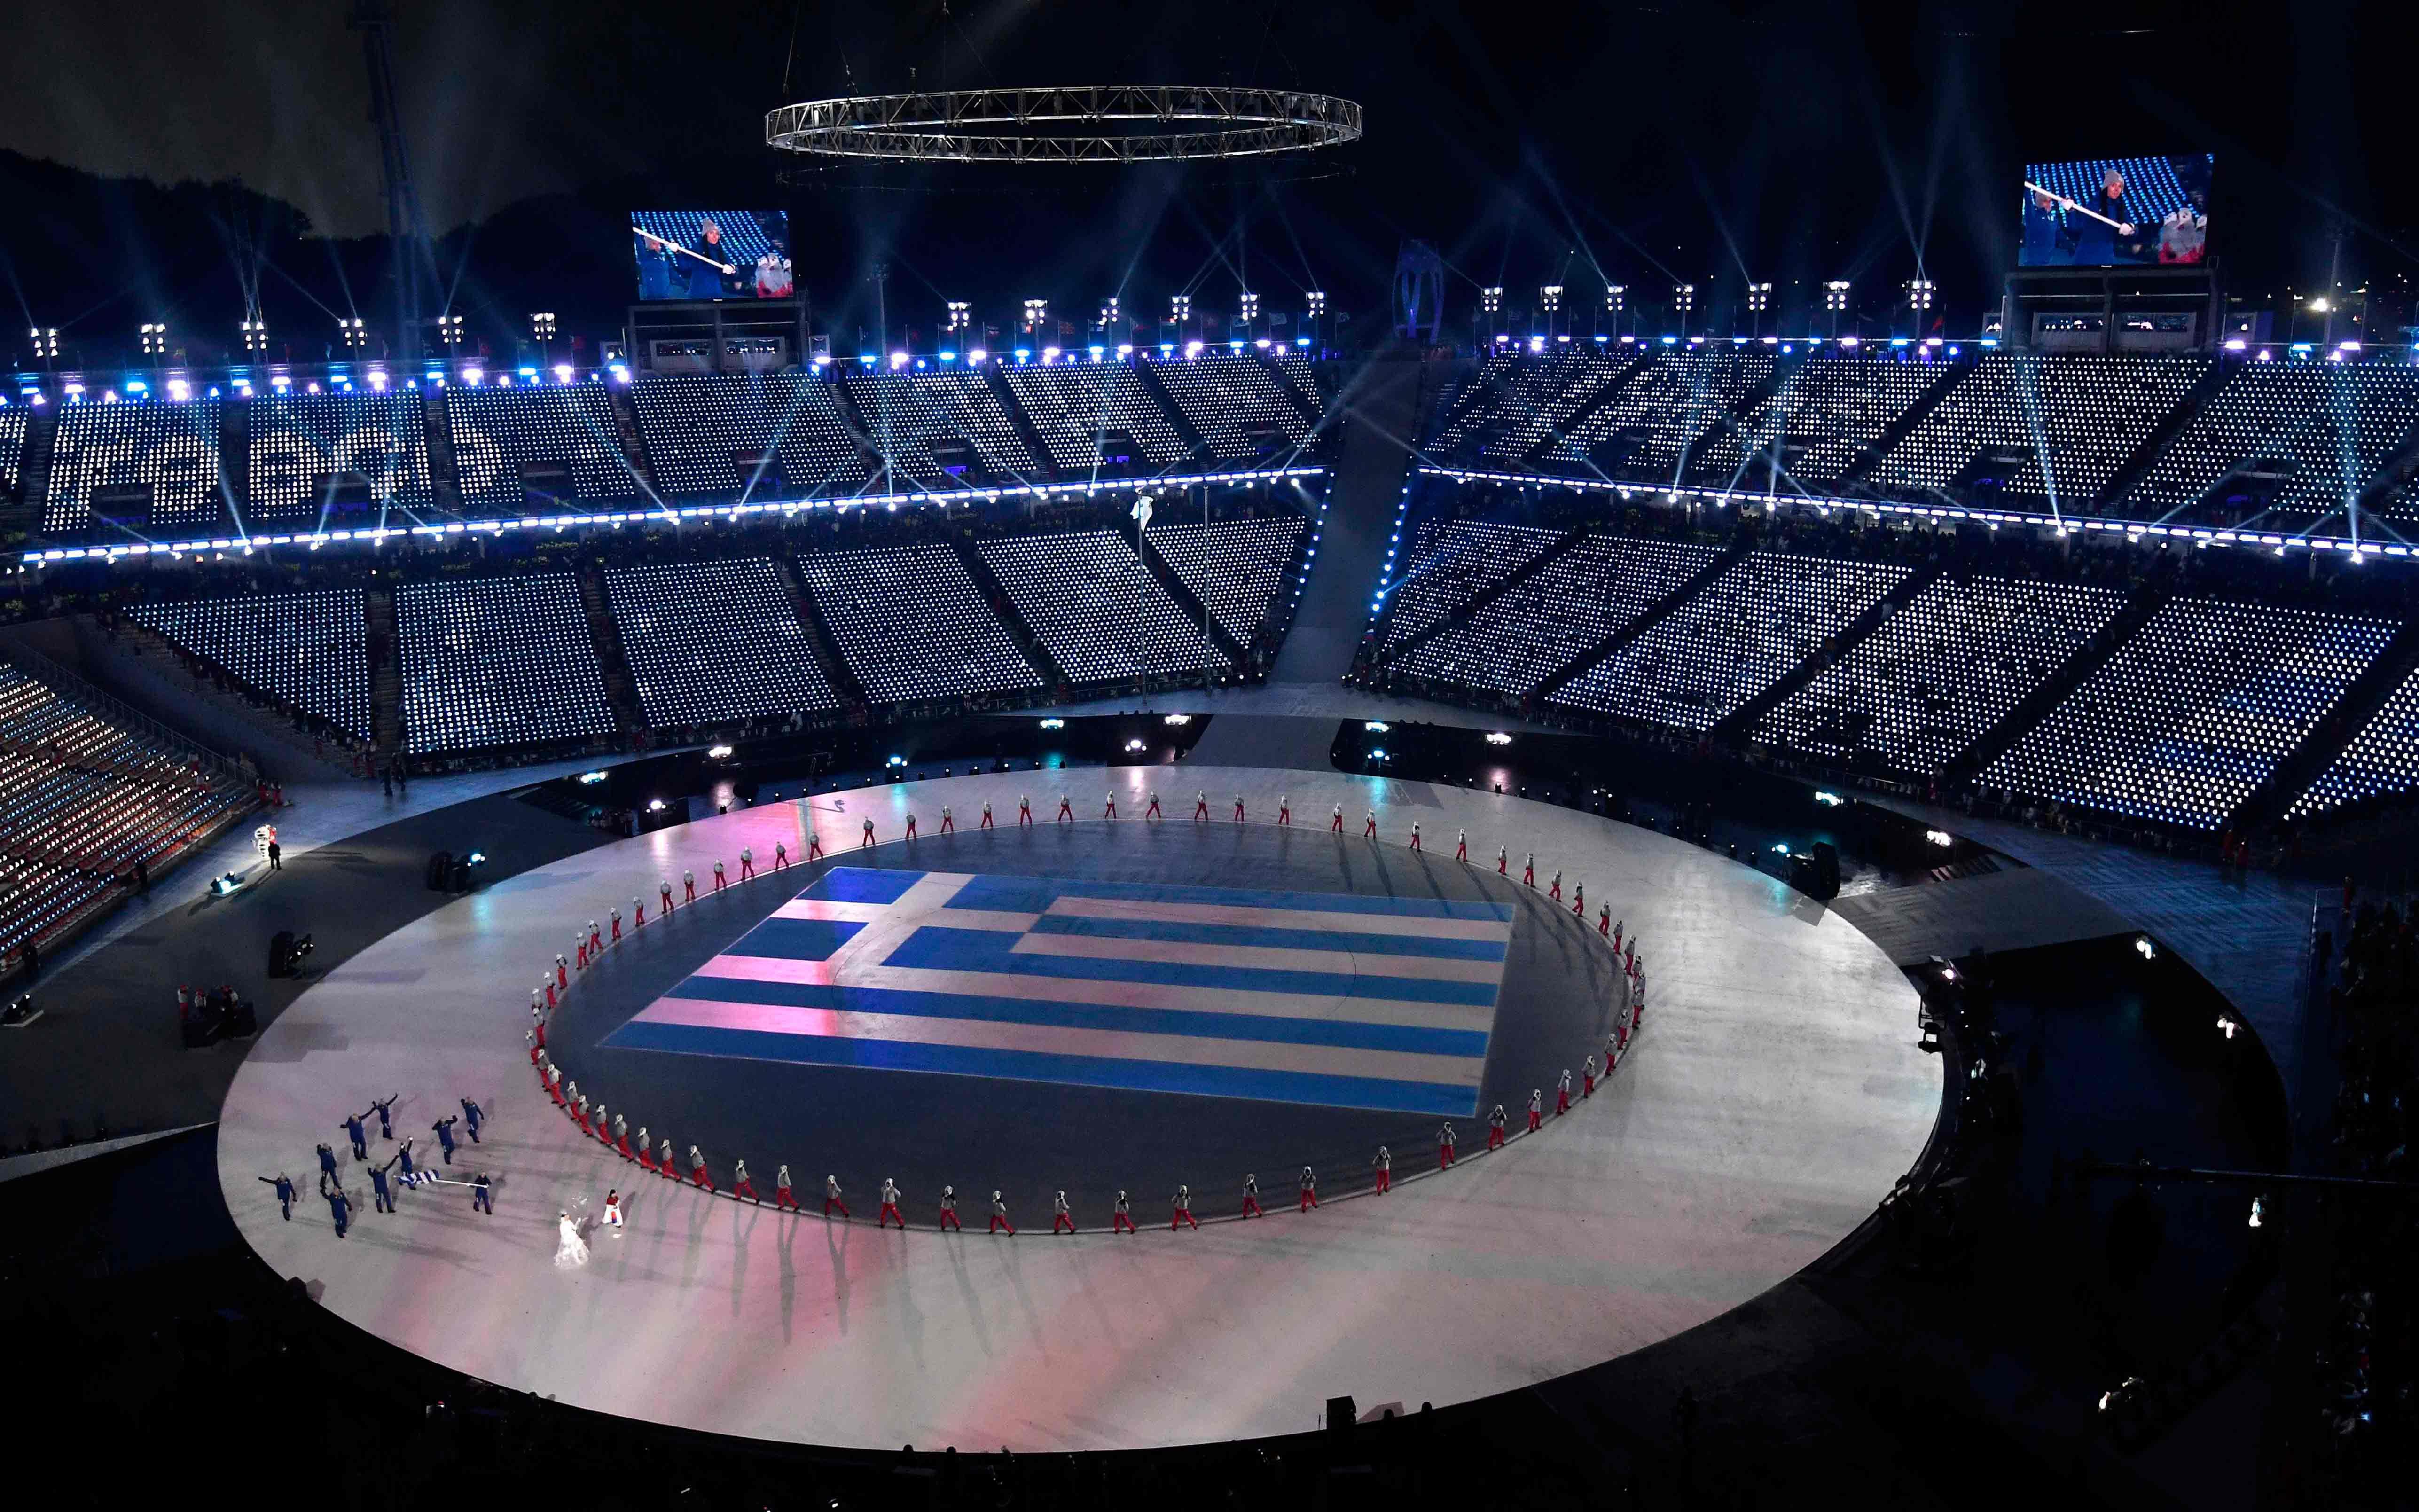 olympiakoiathina